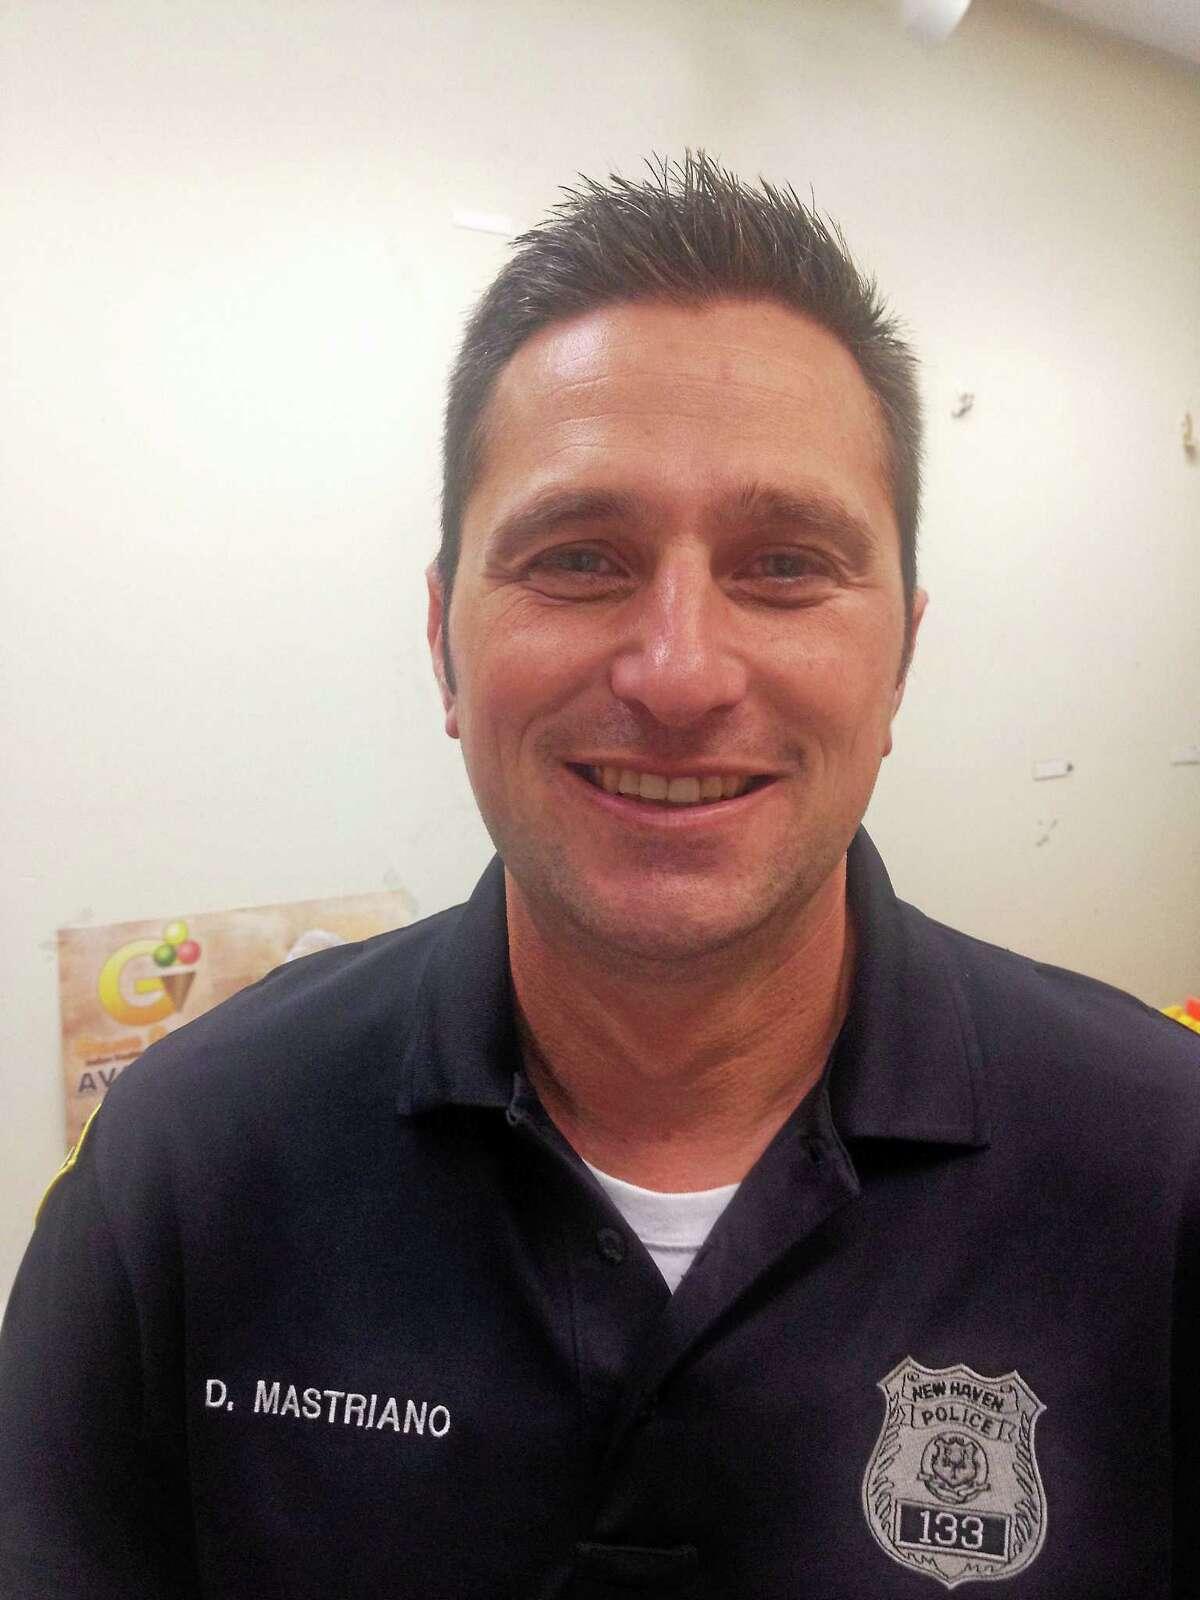 Officer Dennis Mastriano